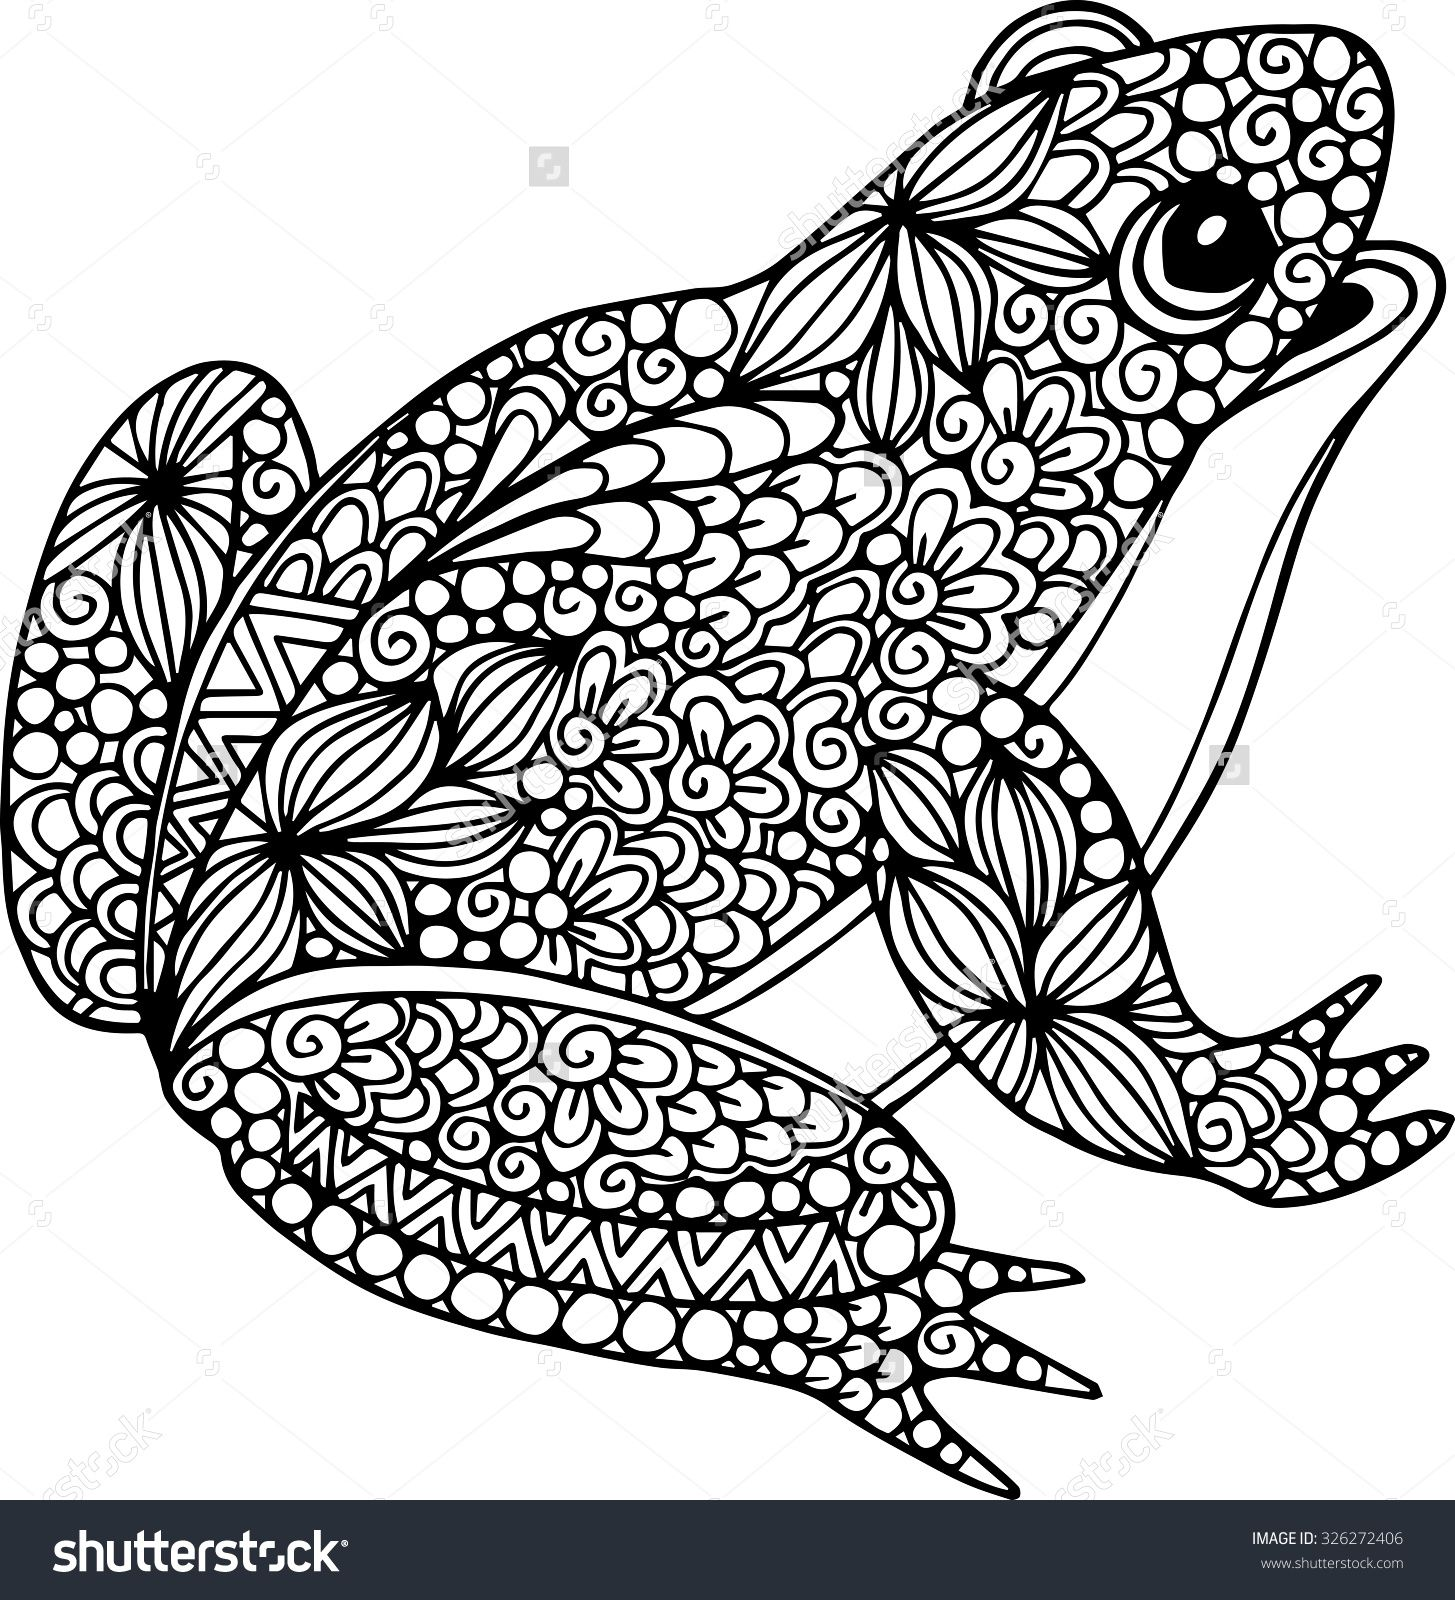 Frog Mandala Coloring Pages